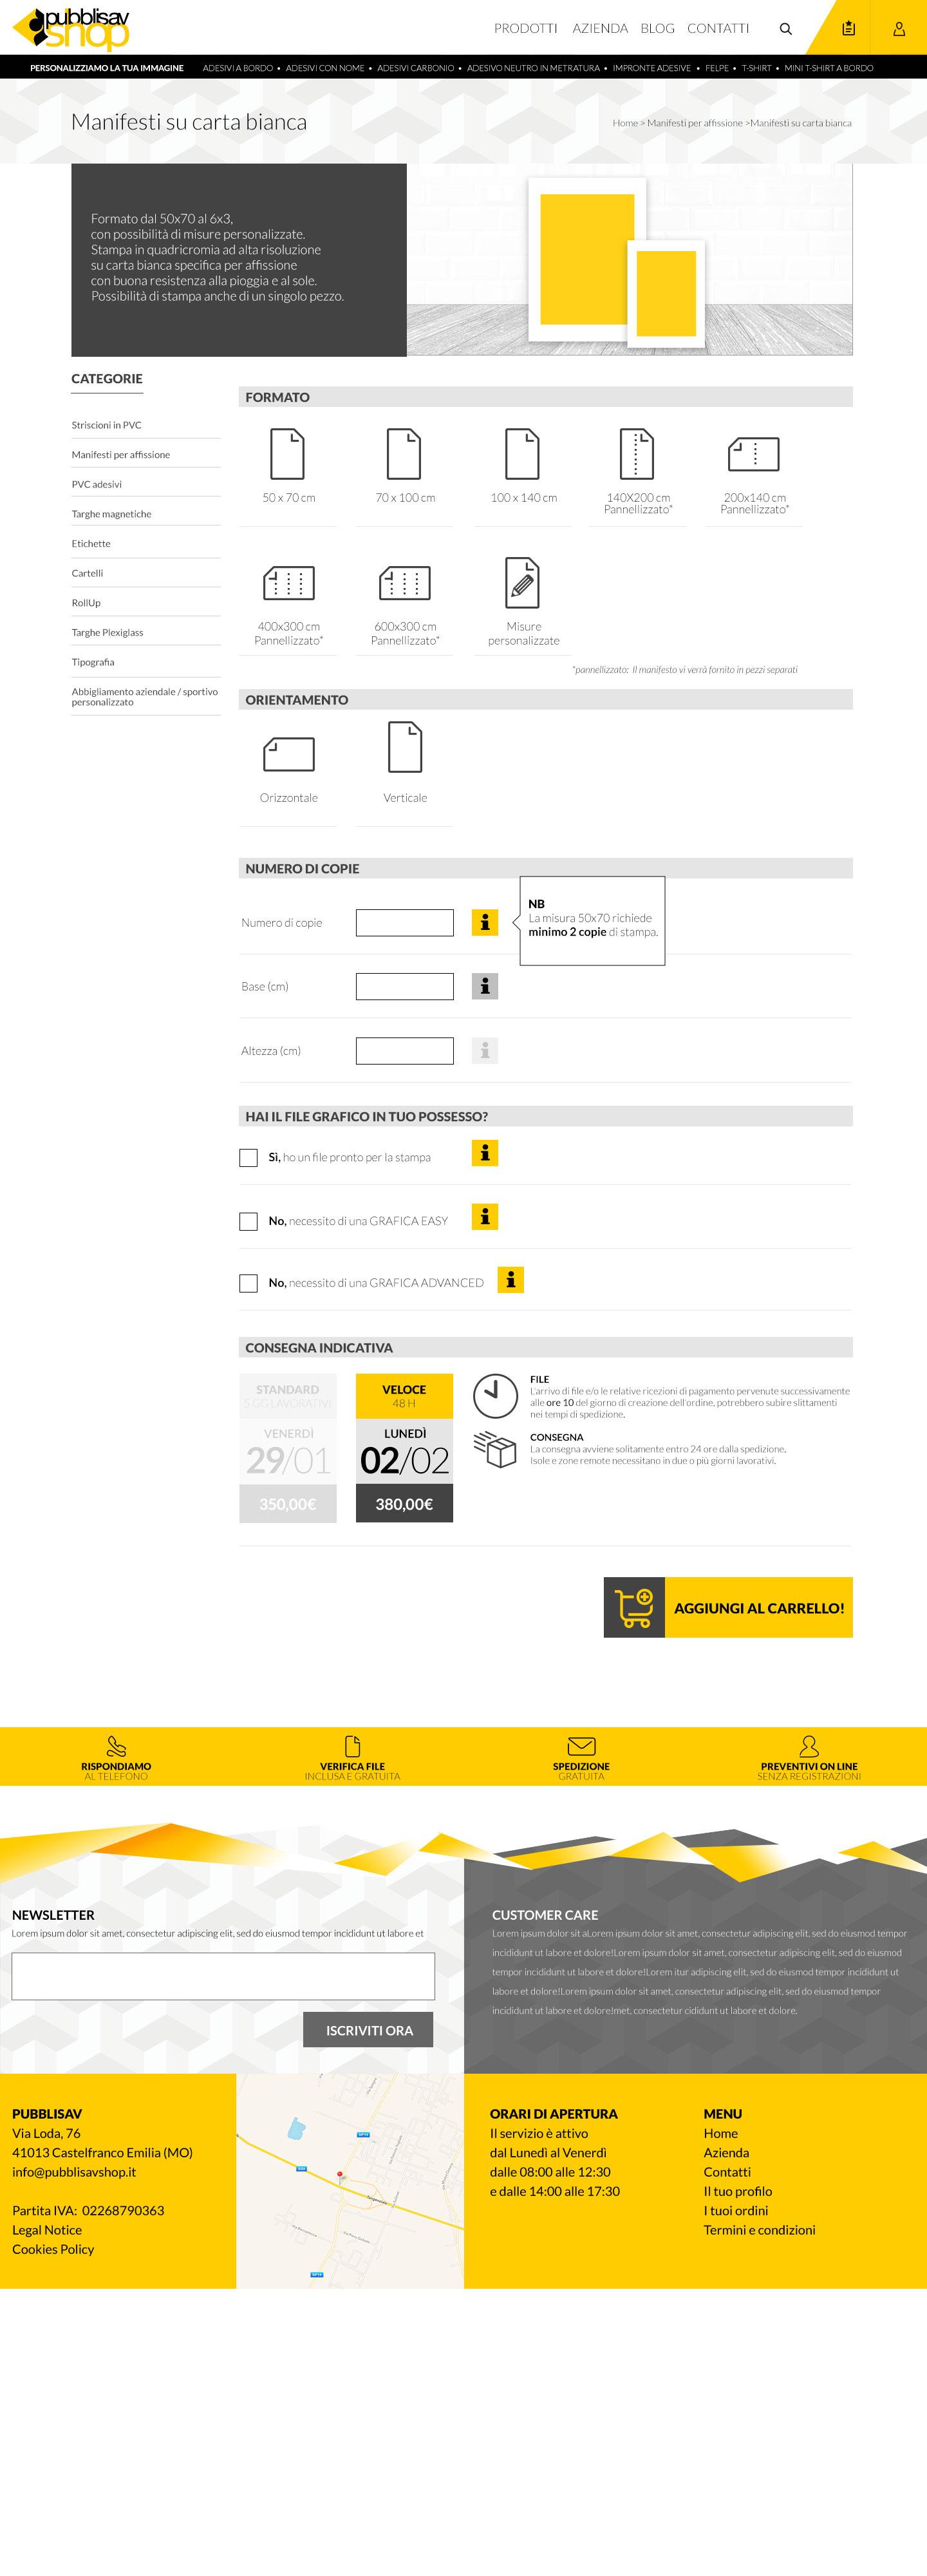 magento-reggioemilia-modena-webdesign-ecommerce